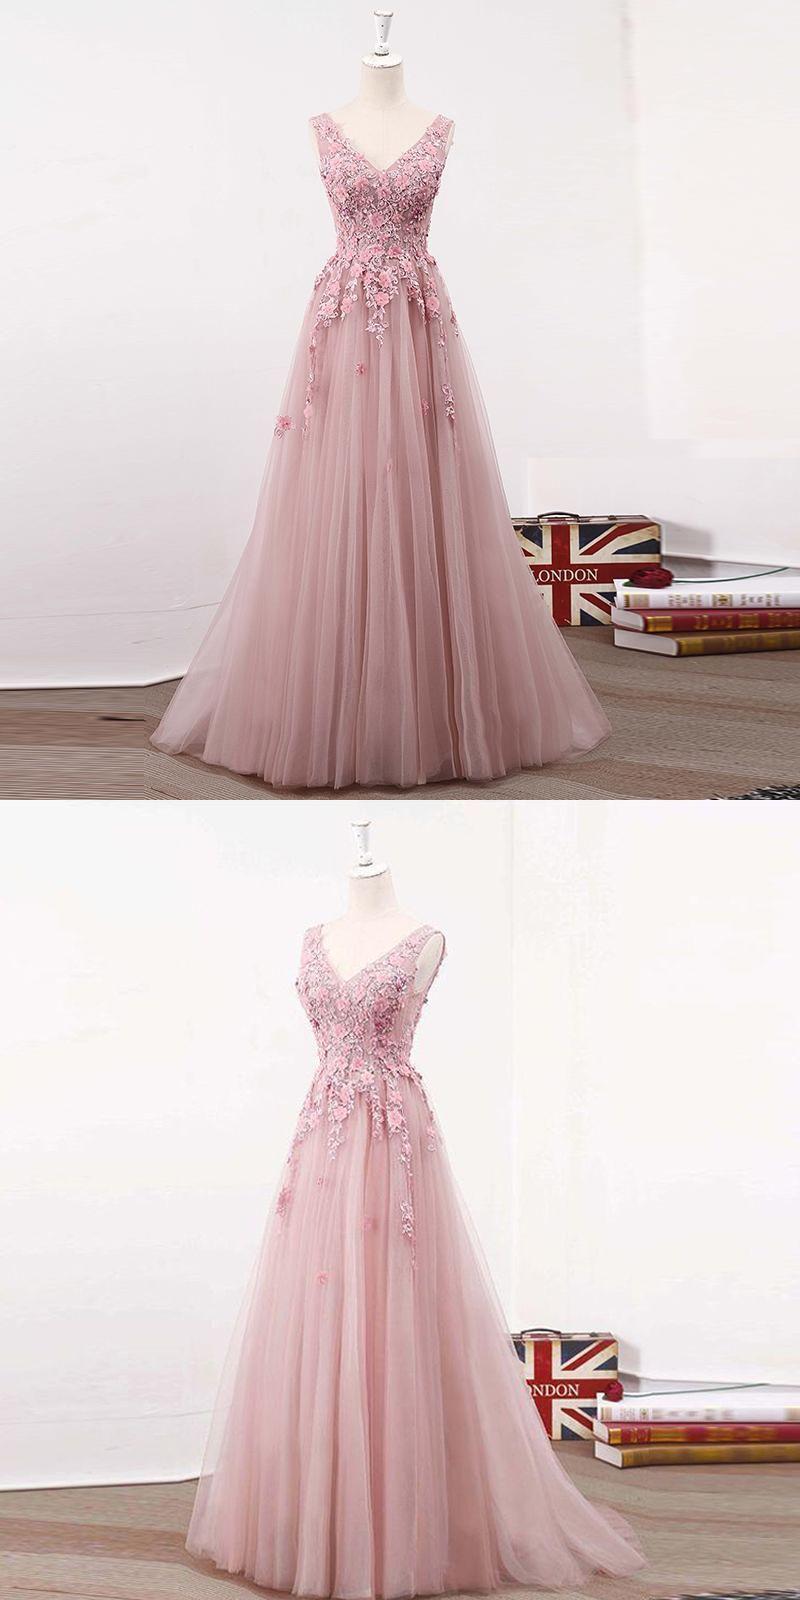 Elegant aline vneck sleeveless pink tulle long prom dress with